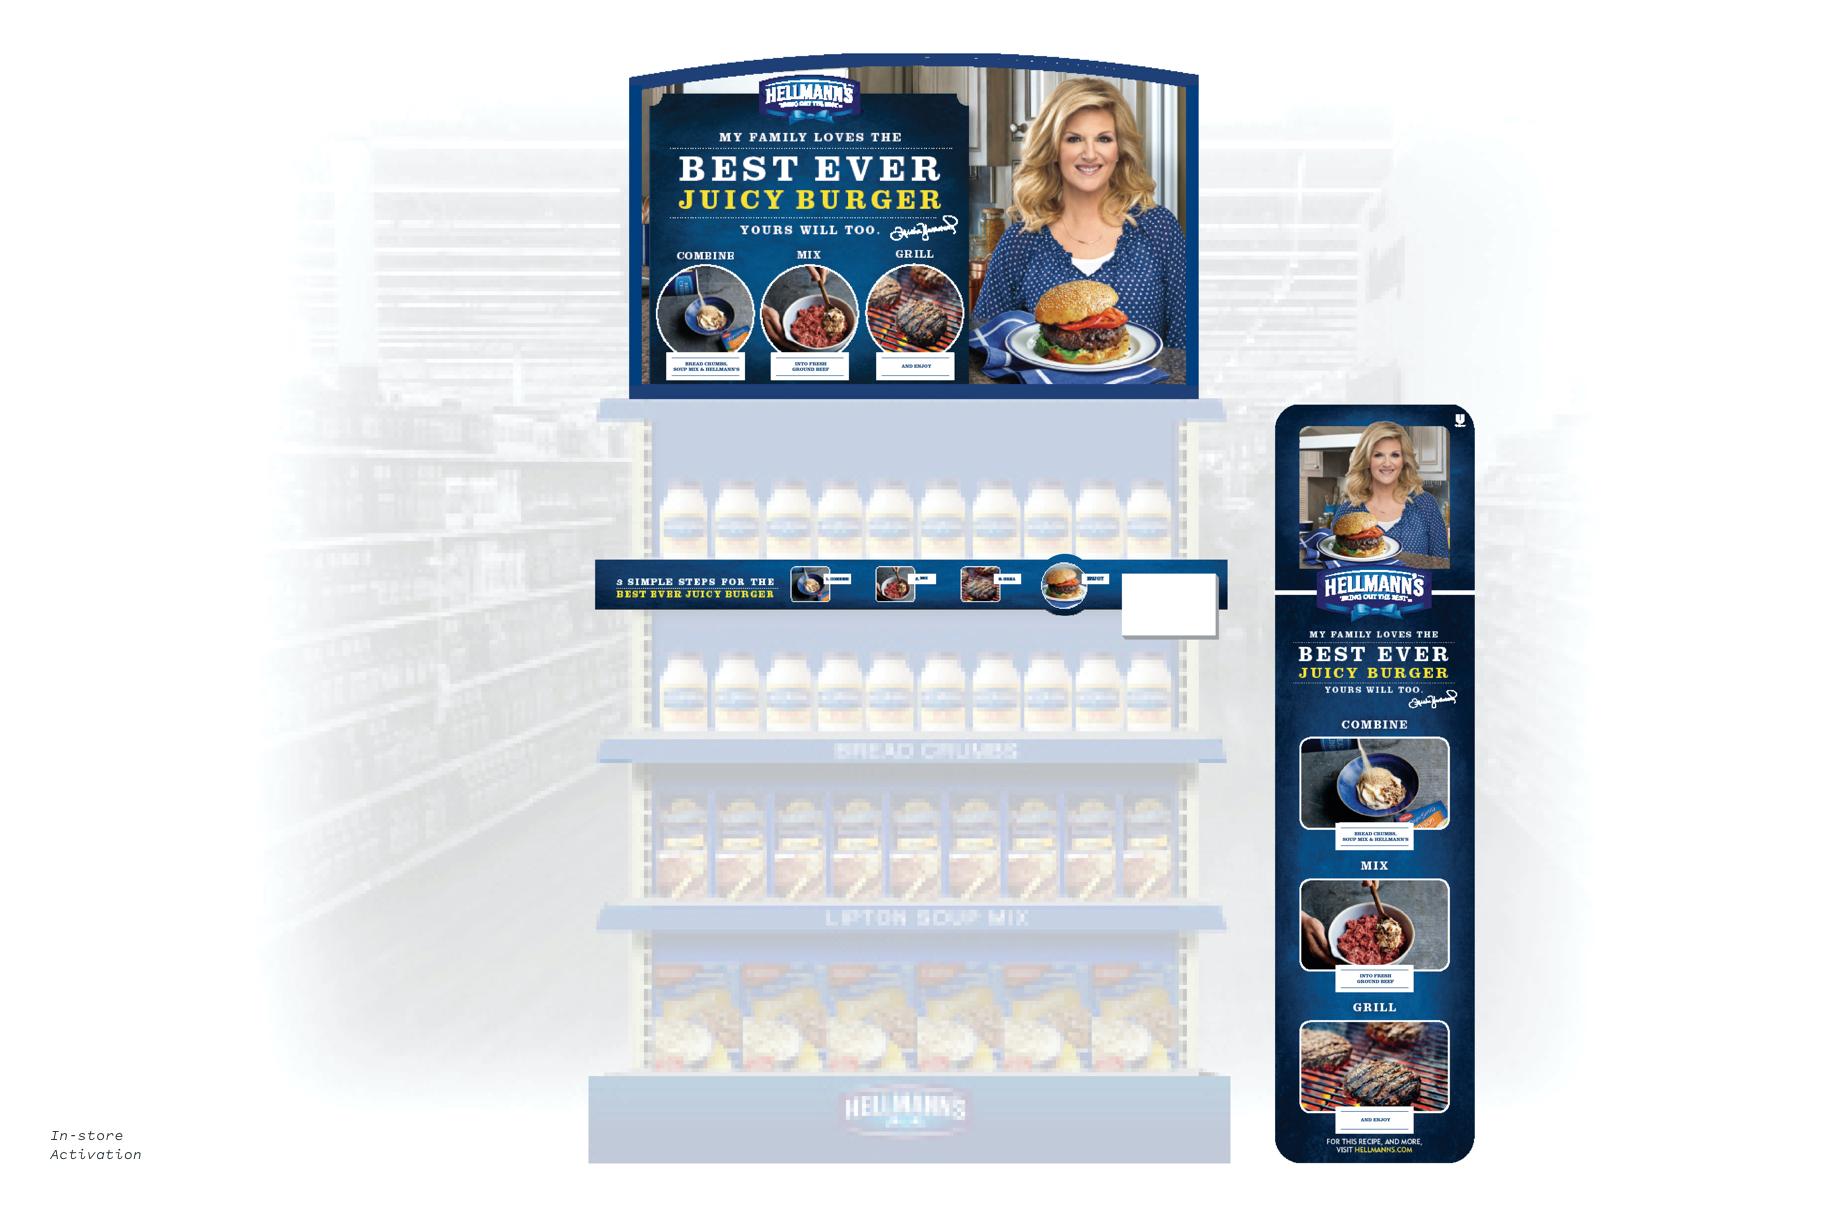 Hellmann's In-store Activation